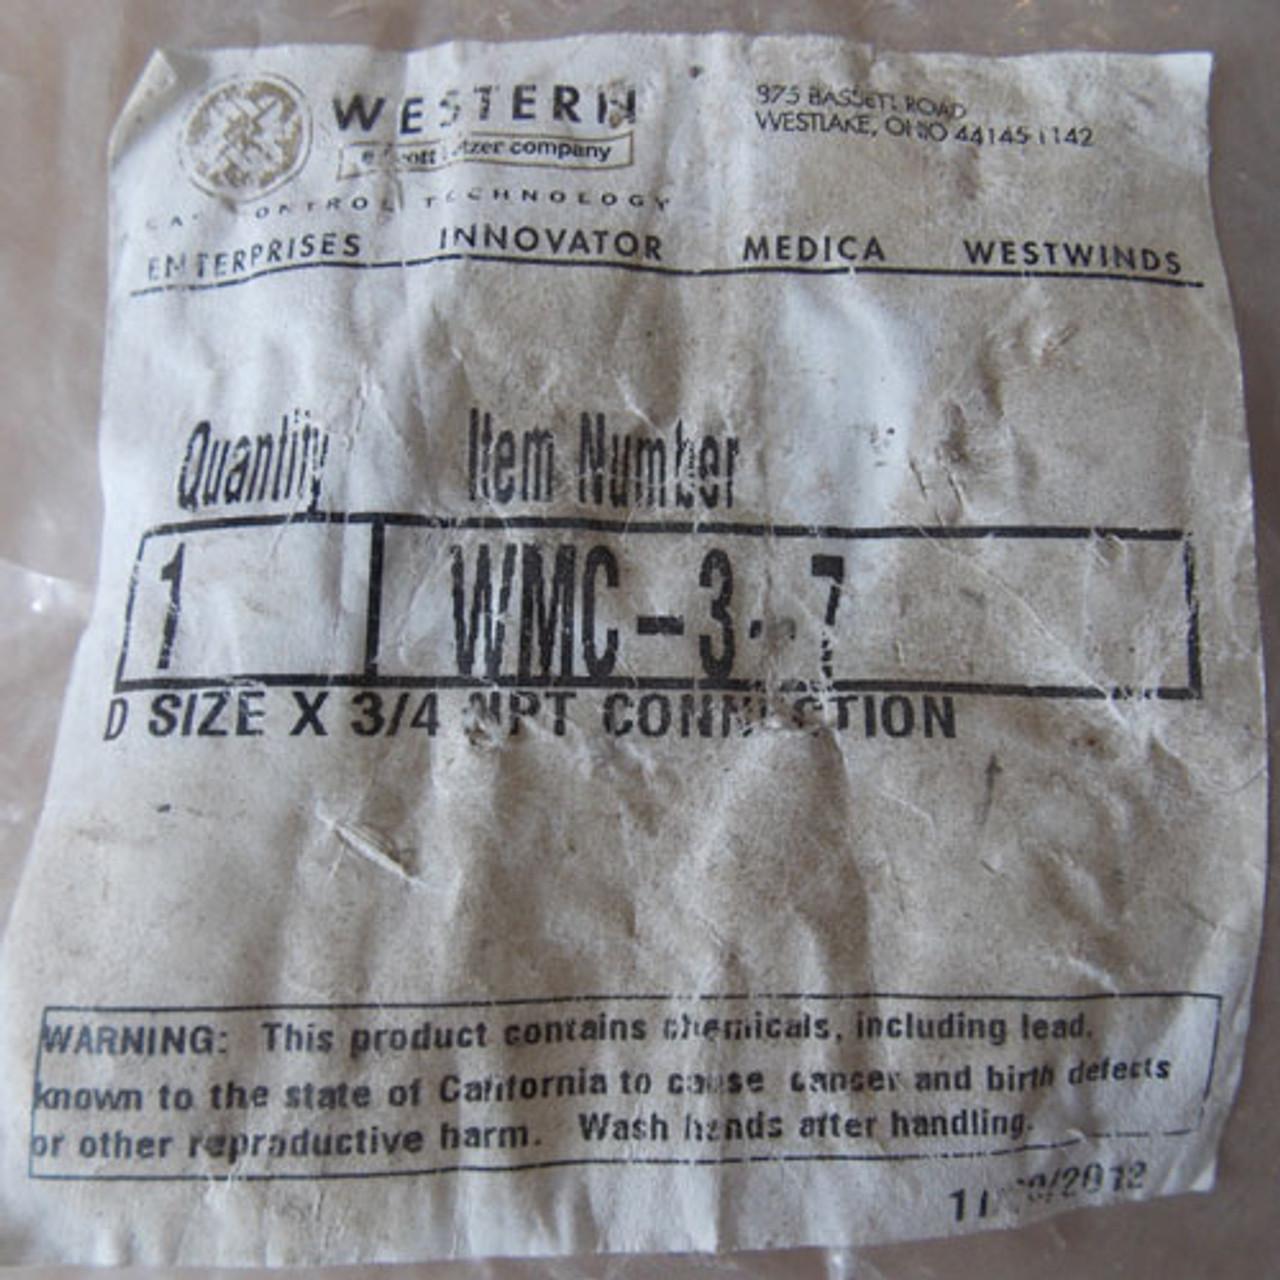 "Western WMC-3-7 D Size x 3/4"" NPT Connection - New"